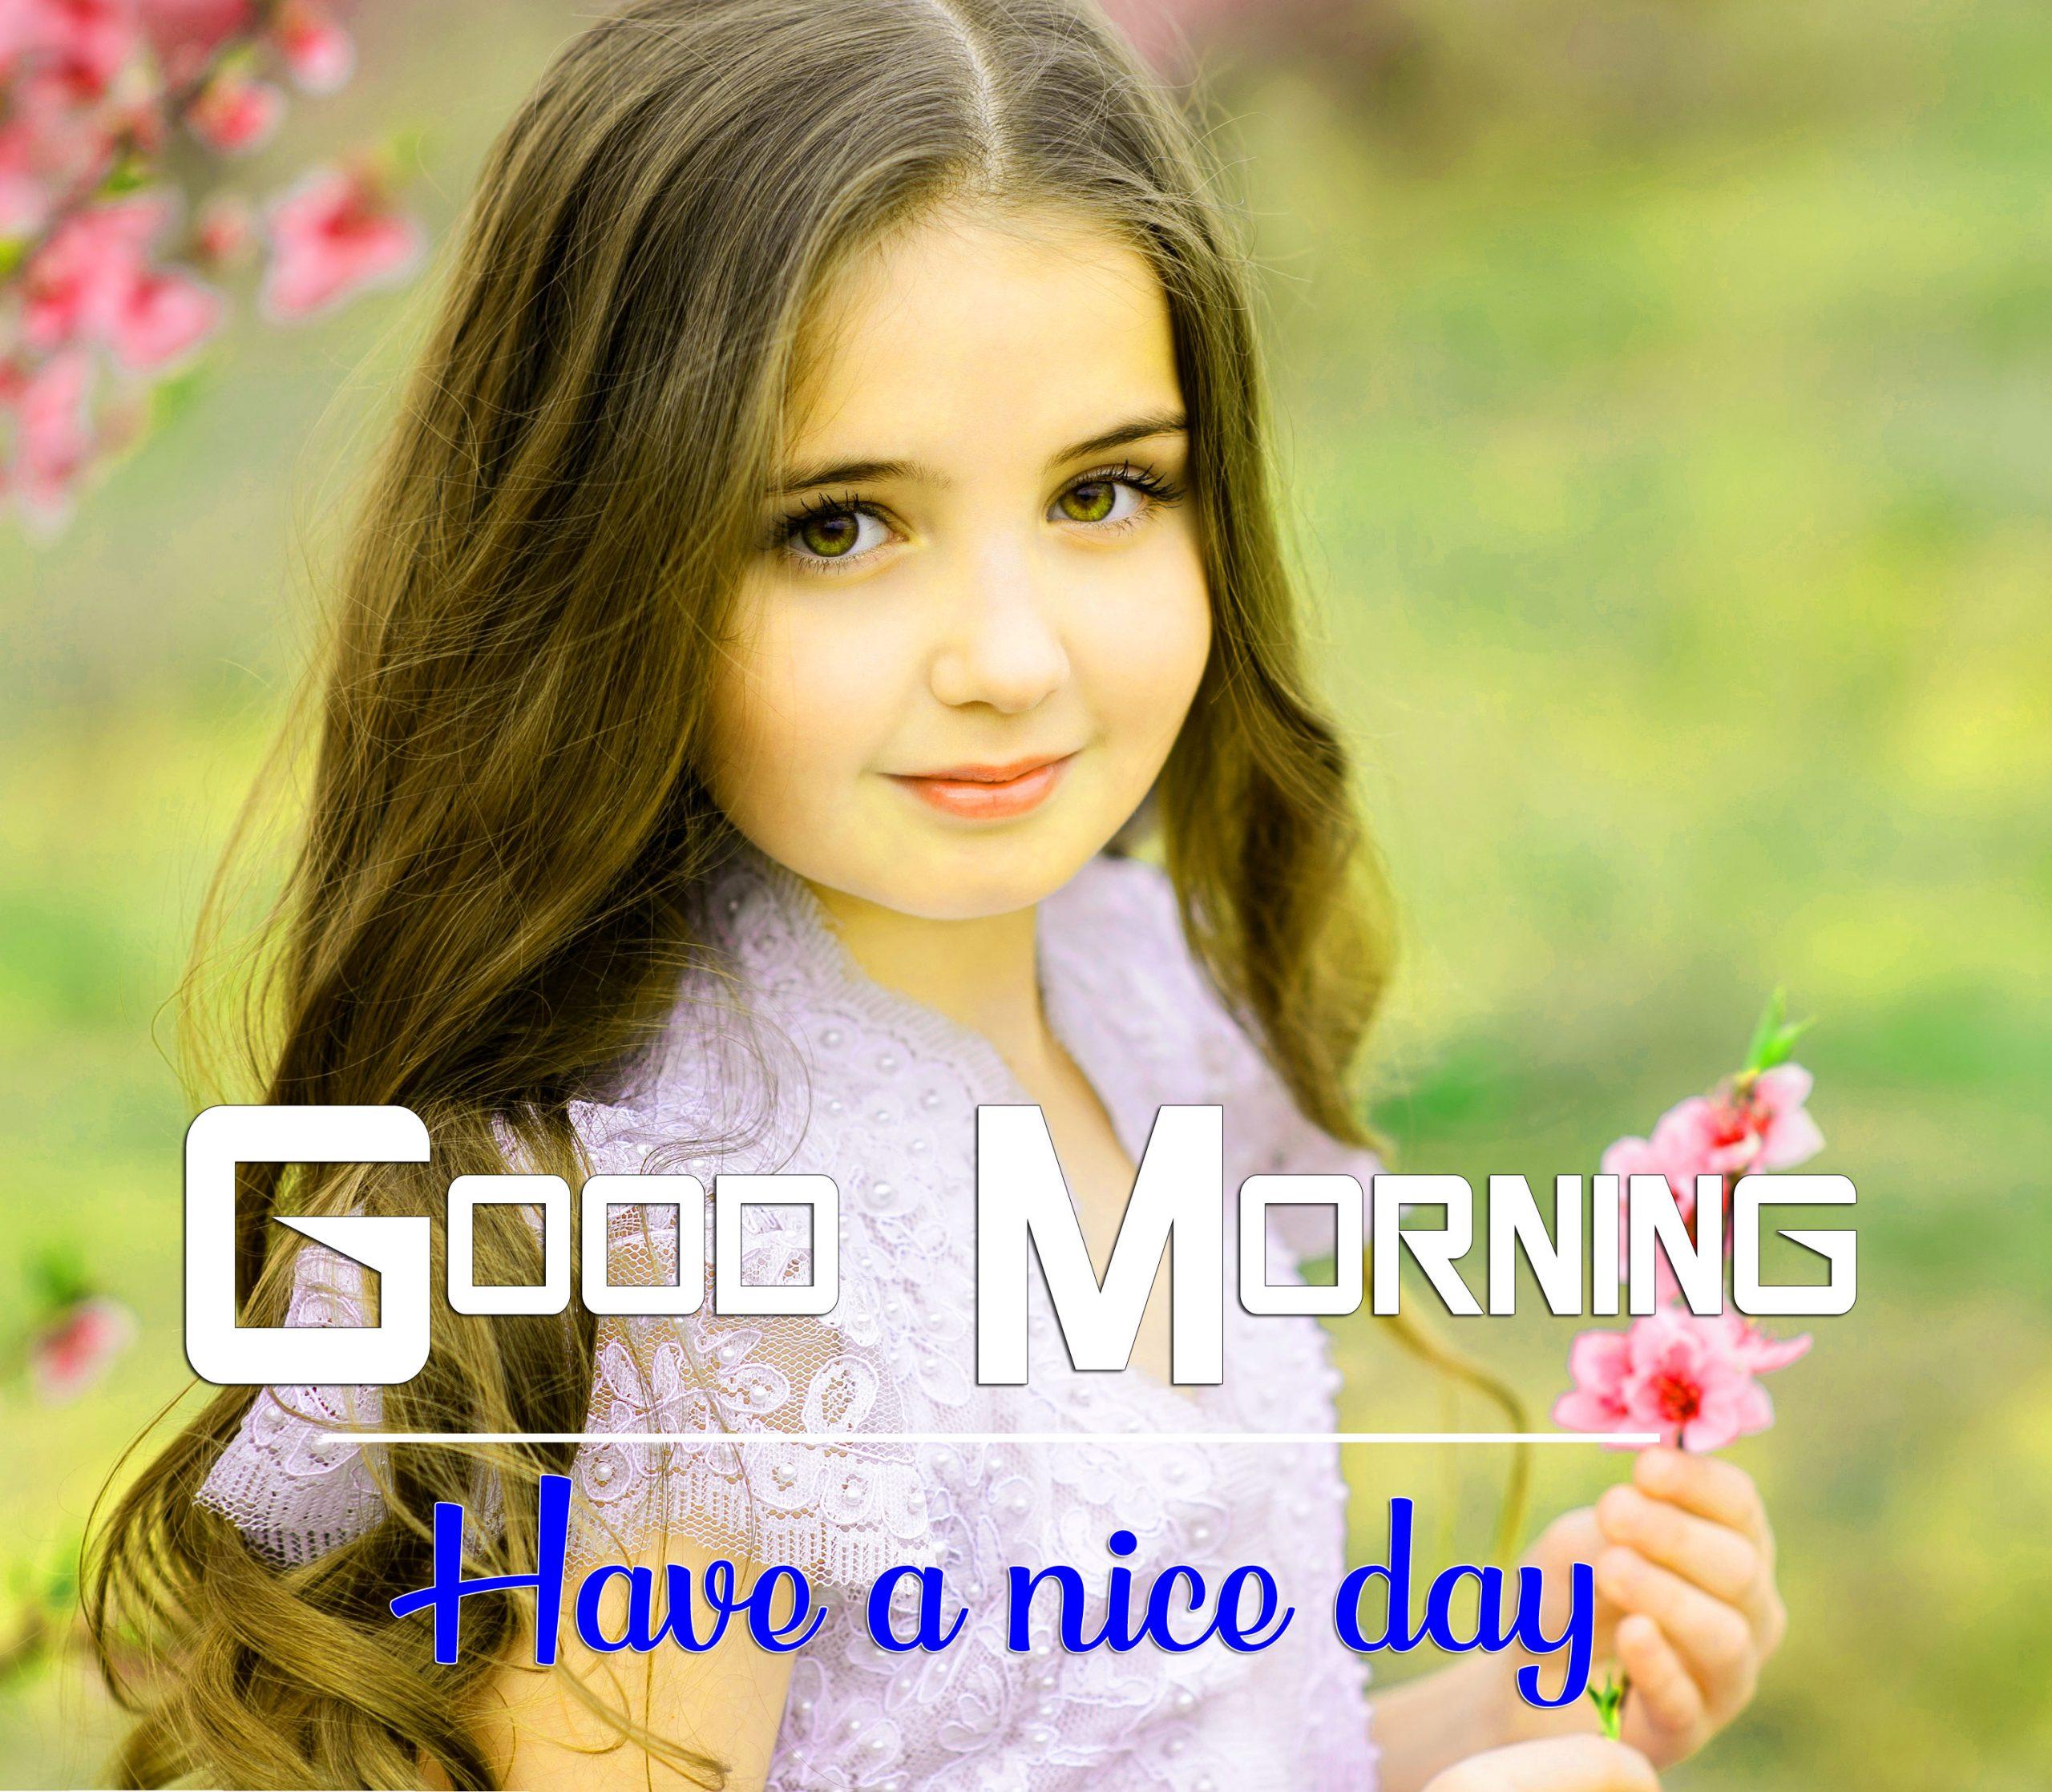 Cute Girls good morning Whatsapp dp Images